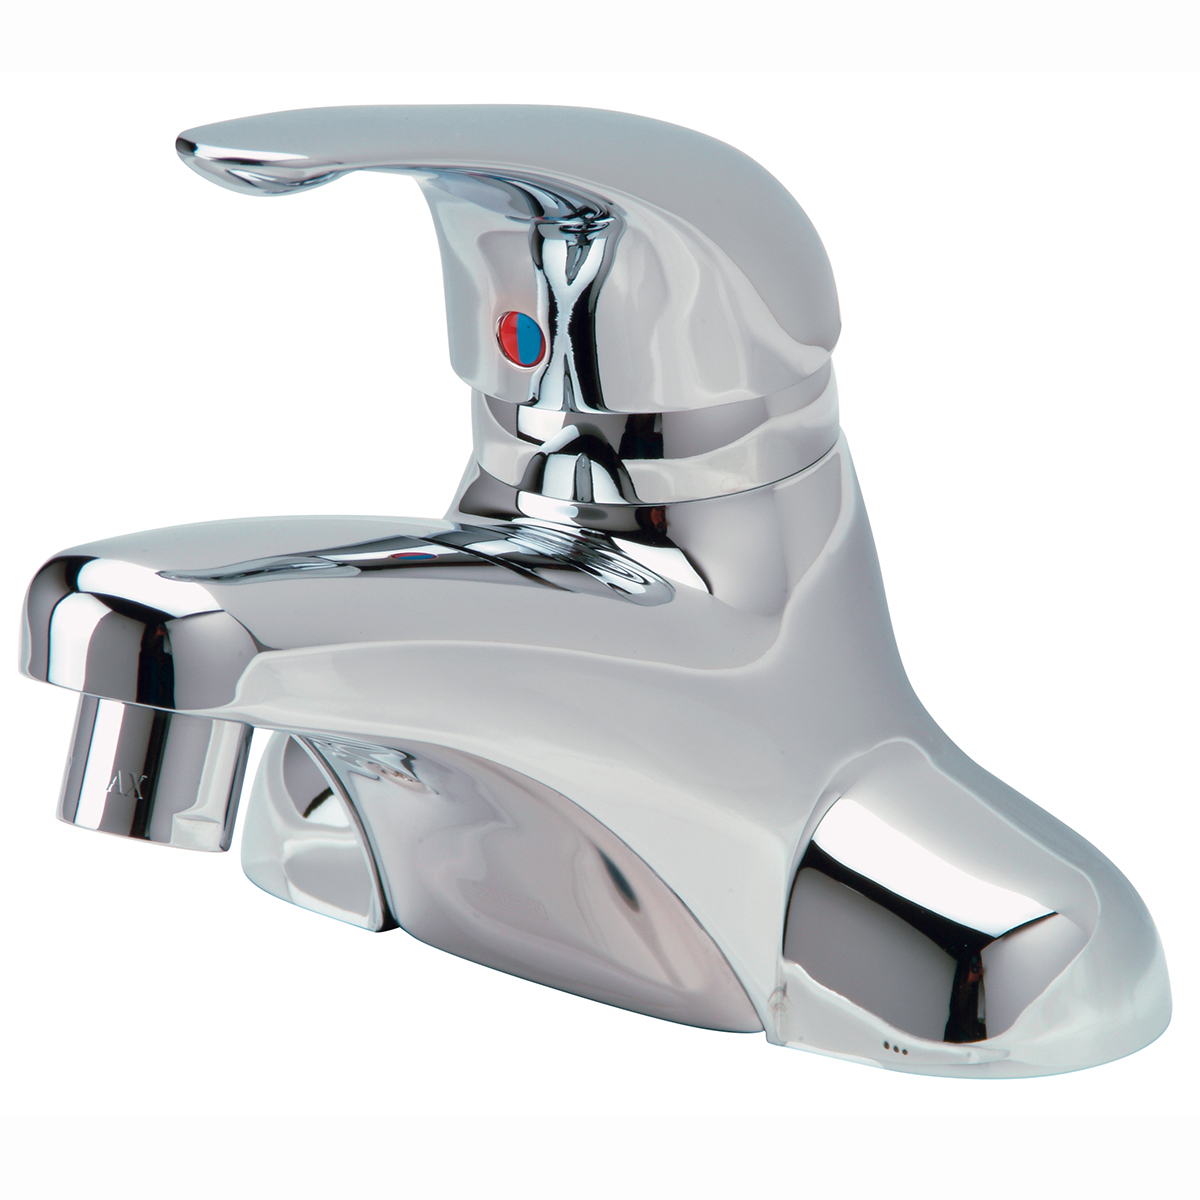 Zurn® AquaSpec® Z7440-XL Centerset Bathroom Faucet, Polished Chrome, 1 Handles, 2.2 gpm